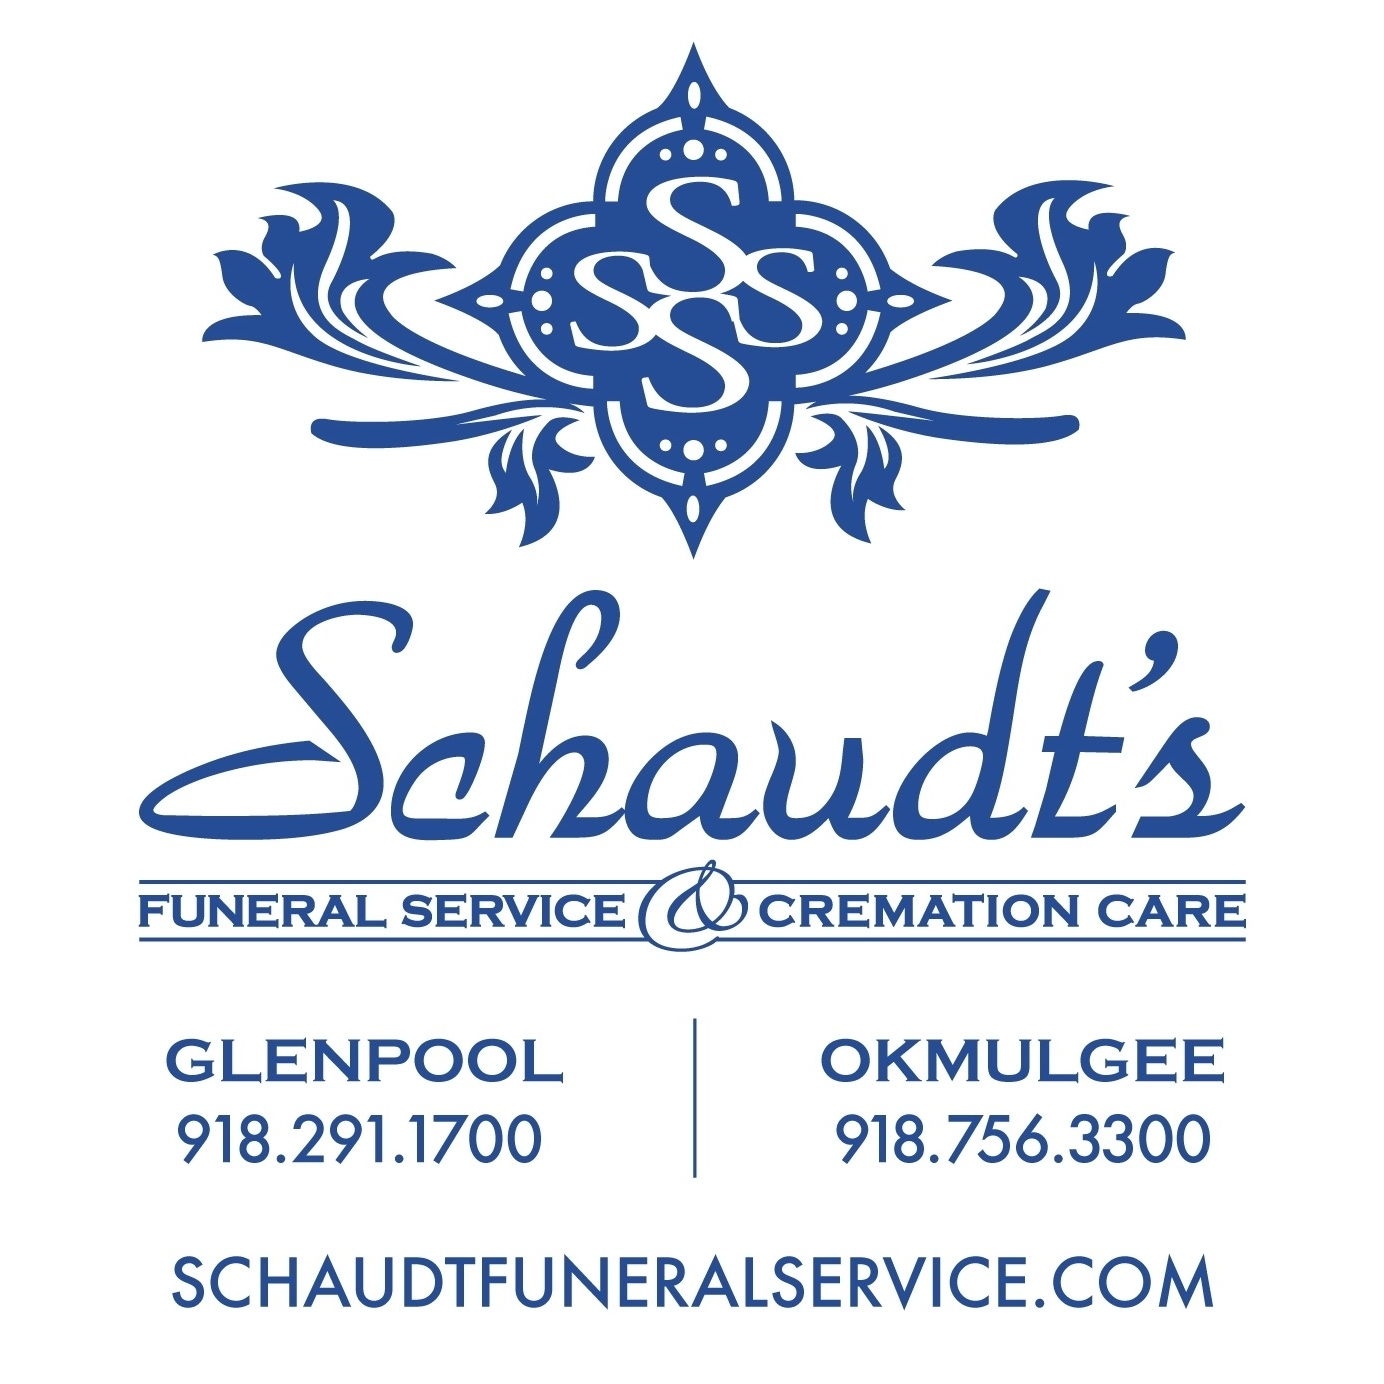 Schaudt's Okmulgee Funeral Service & Cremation Care